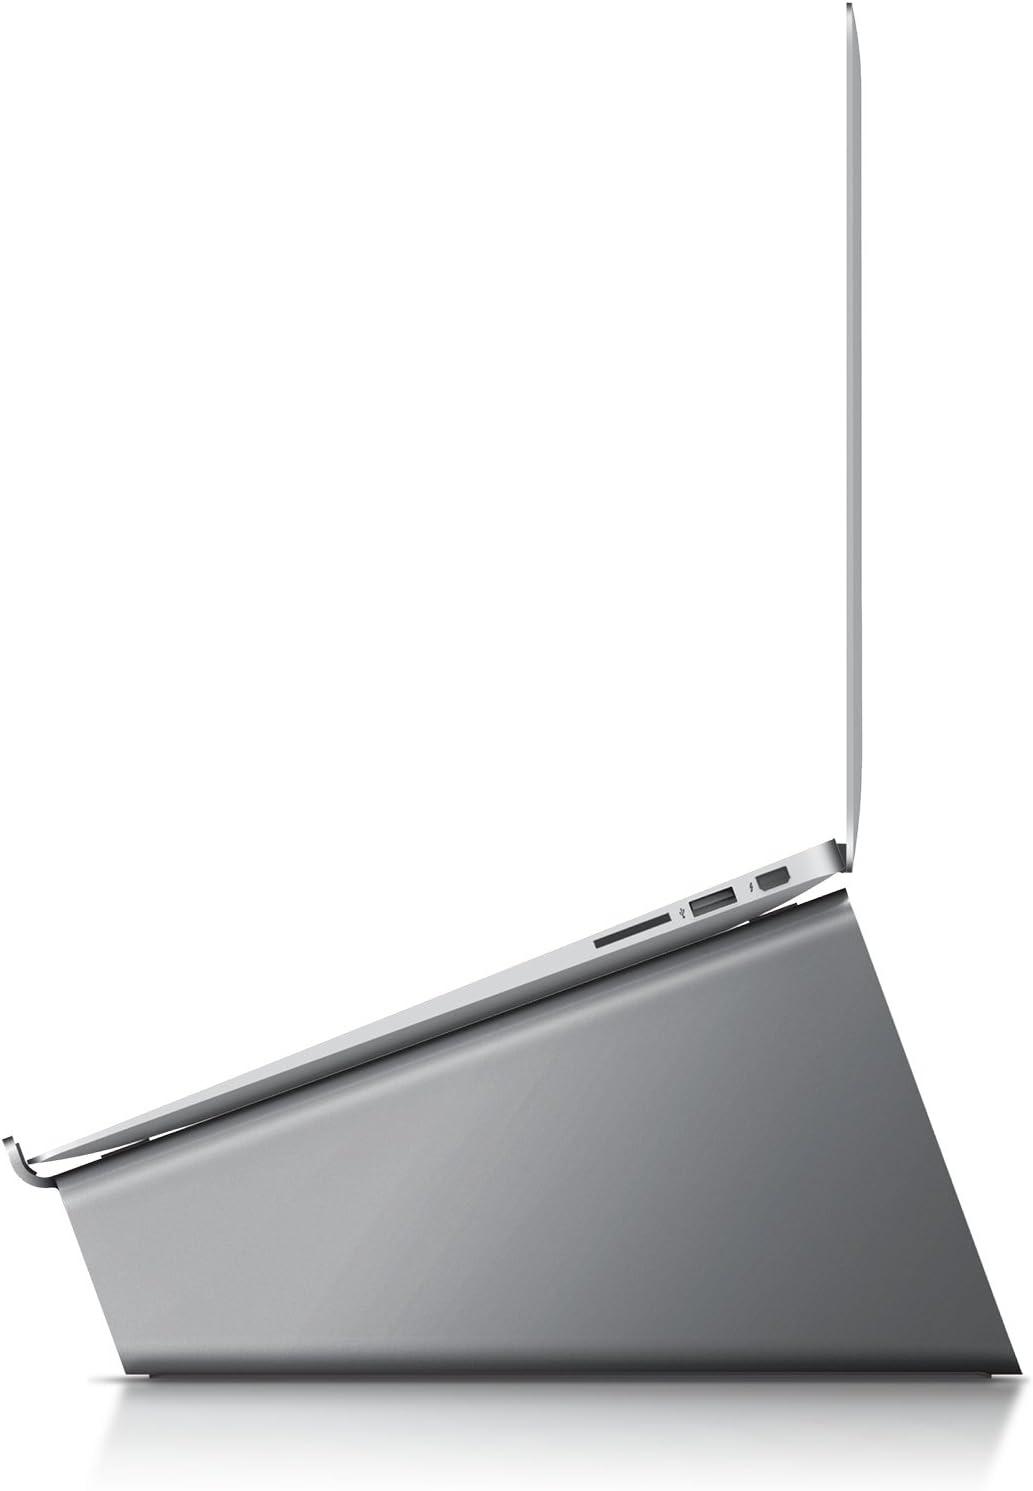 elago L4 Stand - [Desk Organization][Prevents Bad Posture][Natural Heat Sink] - for Laptop Computers (Dark Grey)